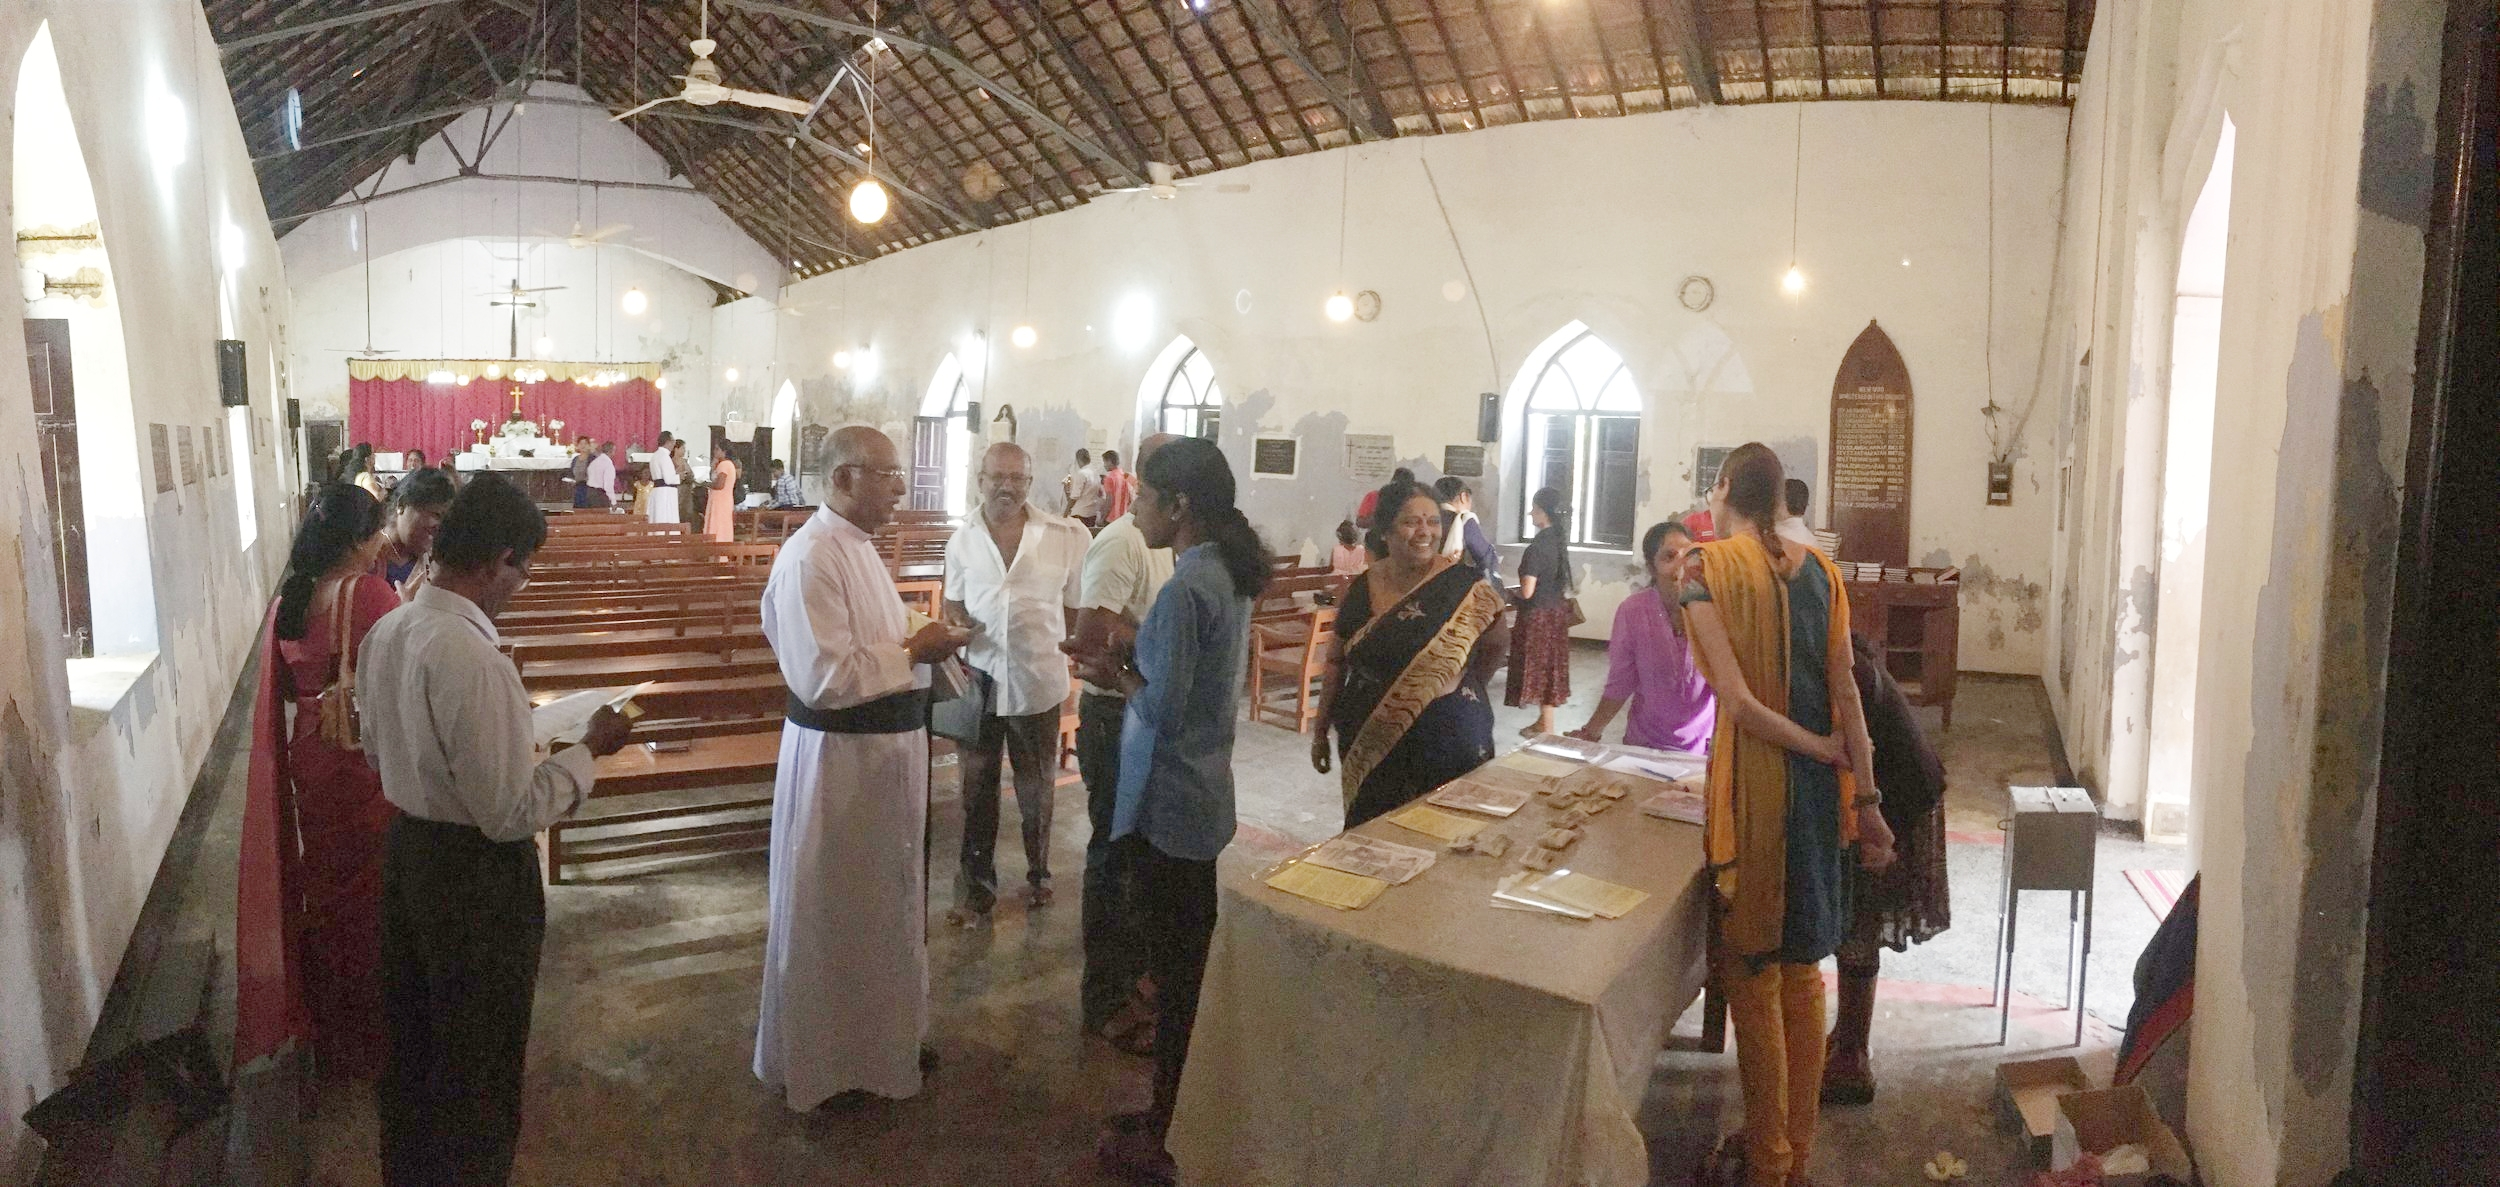 Kirubalini Stephan (center) and Henria Aton (right) and Mirusha Kumarakulasingham (far right) distributing project information at Manipay church. Photo Credit: Mark E. Balmforth